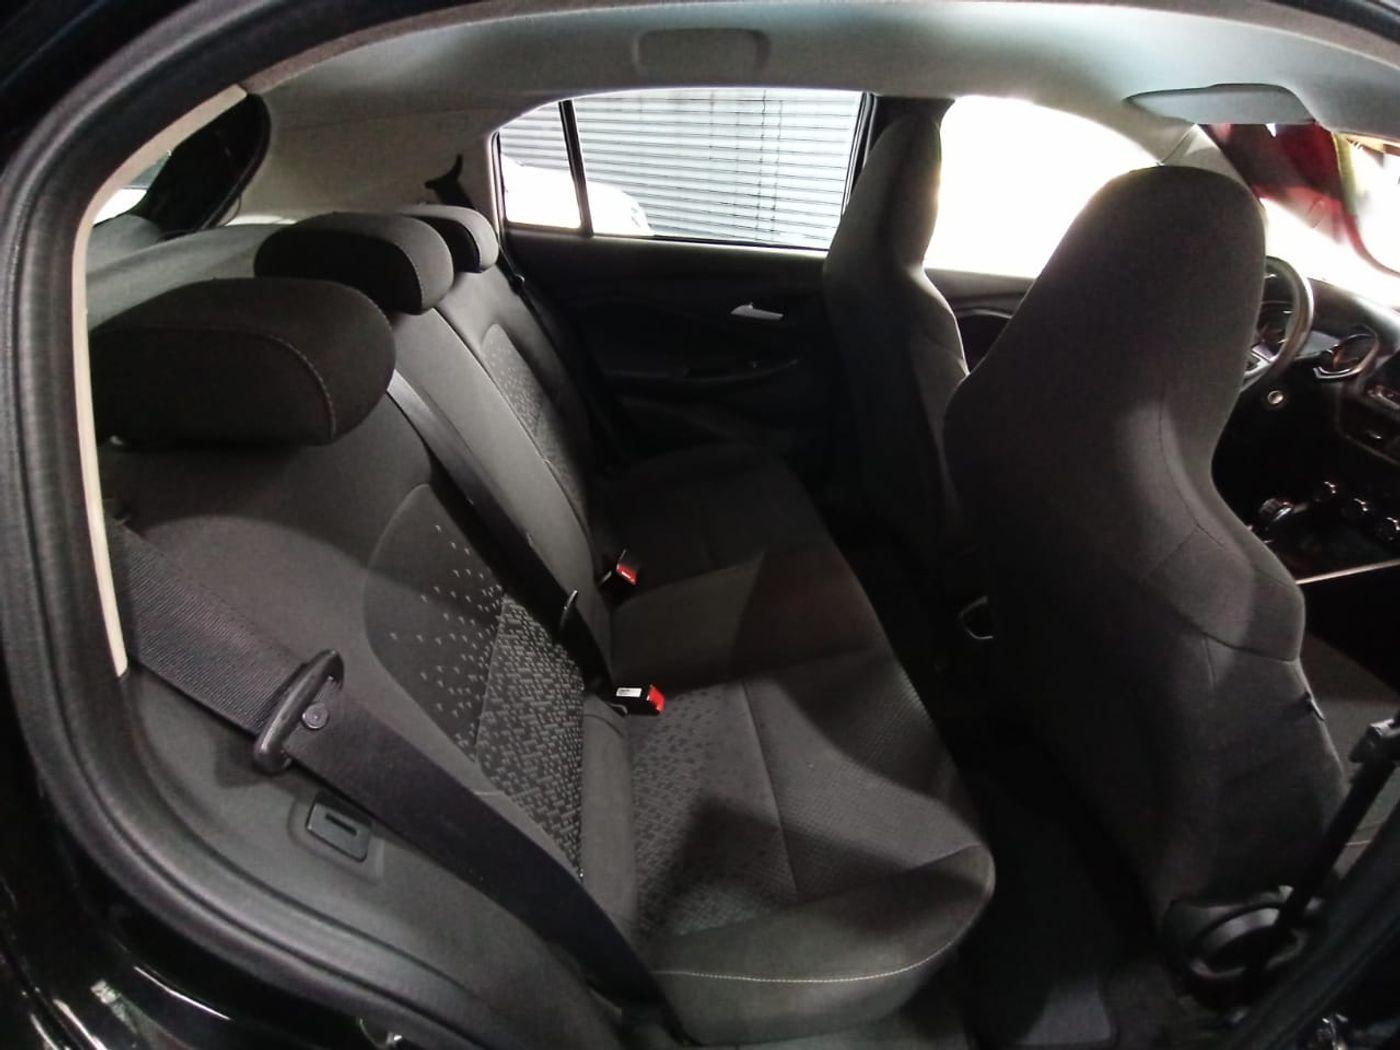 Chevrolet ONIX HATCH LT 1.0 12V TB Flex 5p Mec.